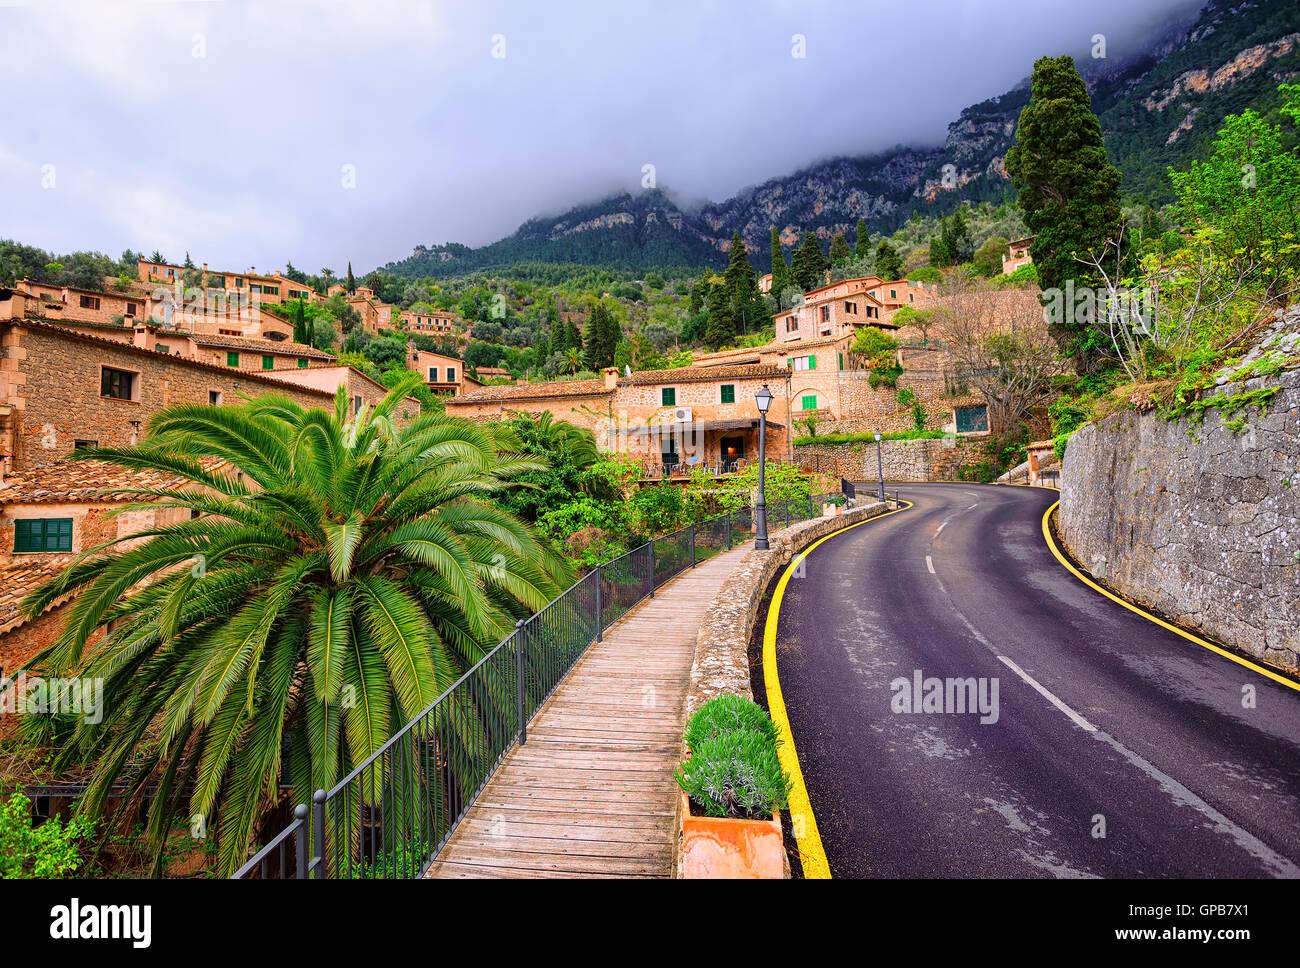 Route asphaltée sinueuse en zone rurale de montagne Tramontana, Mallorca, Espagne Photo Stock